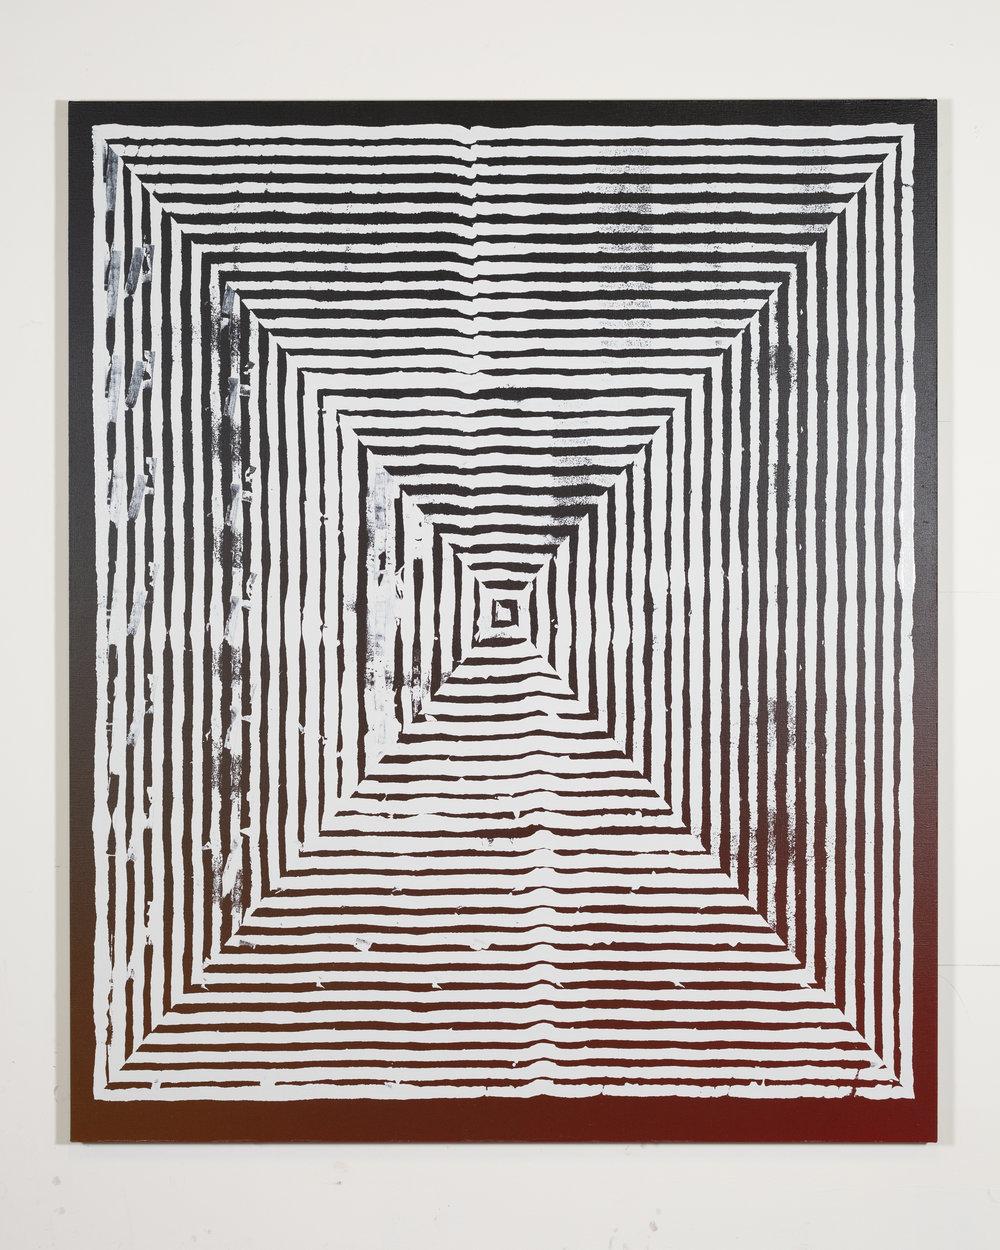 Jason REVOK  -  Kundalini_loop_2/19_A,  2019 Synthetic polymer & oil enamel on linen 72h x 60w inches